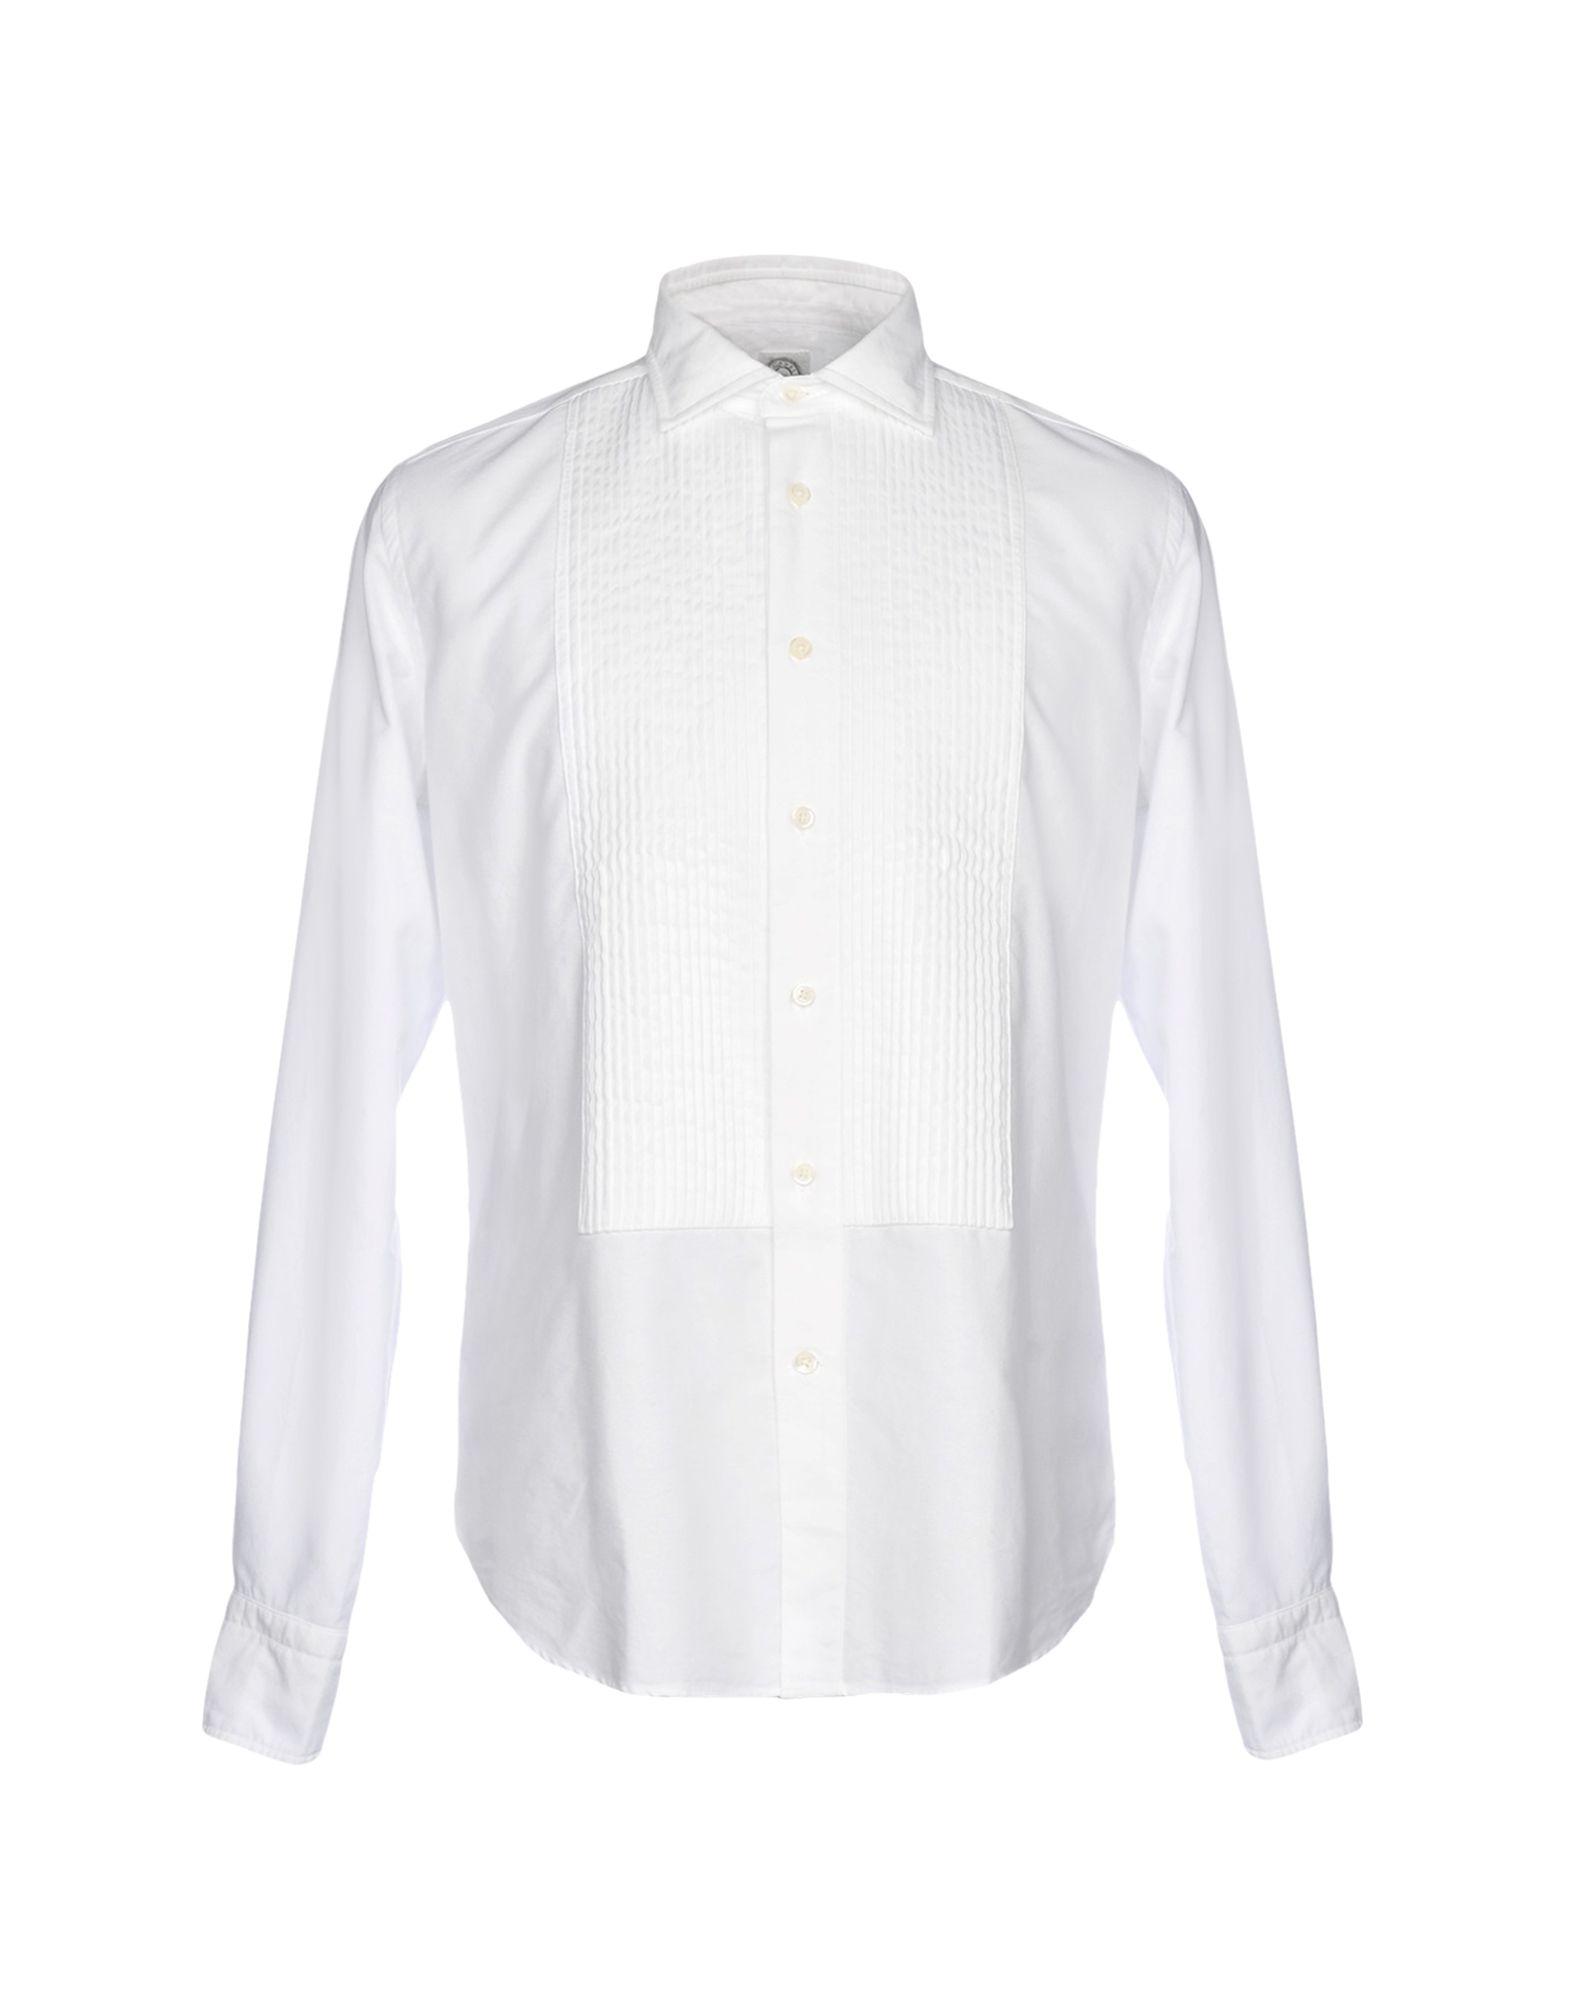 BOLZONELLA 1934 Shirts in White